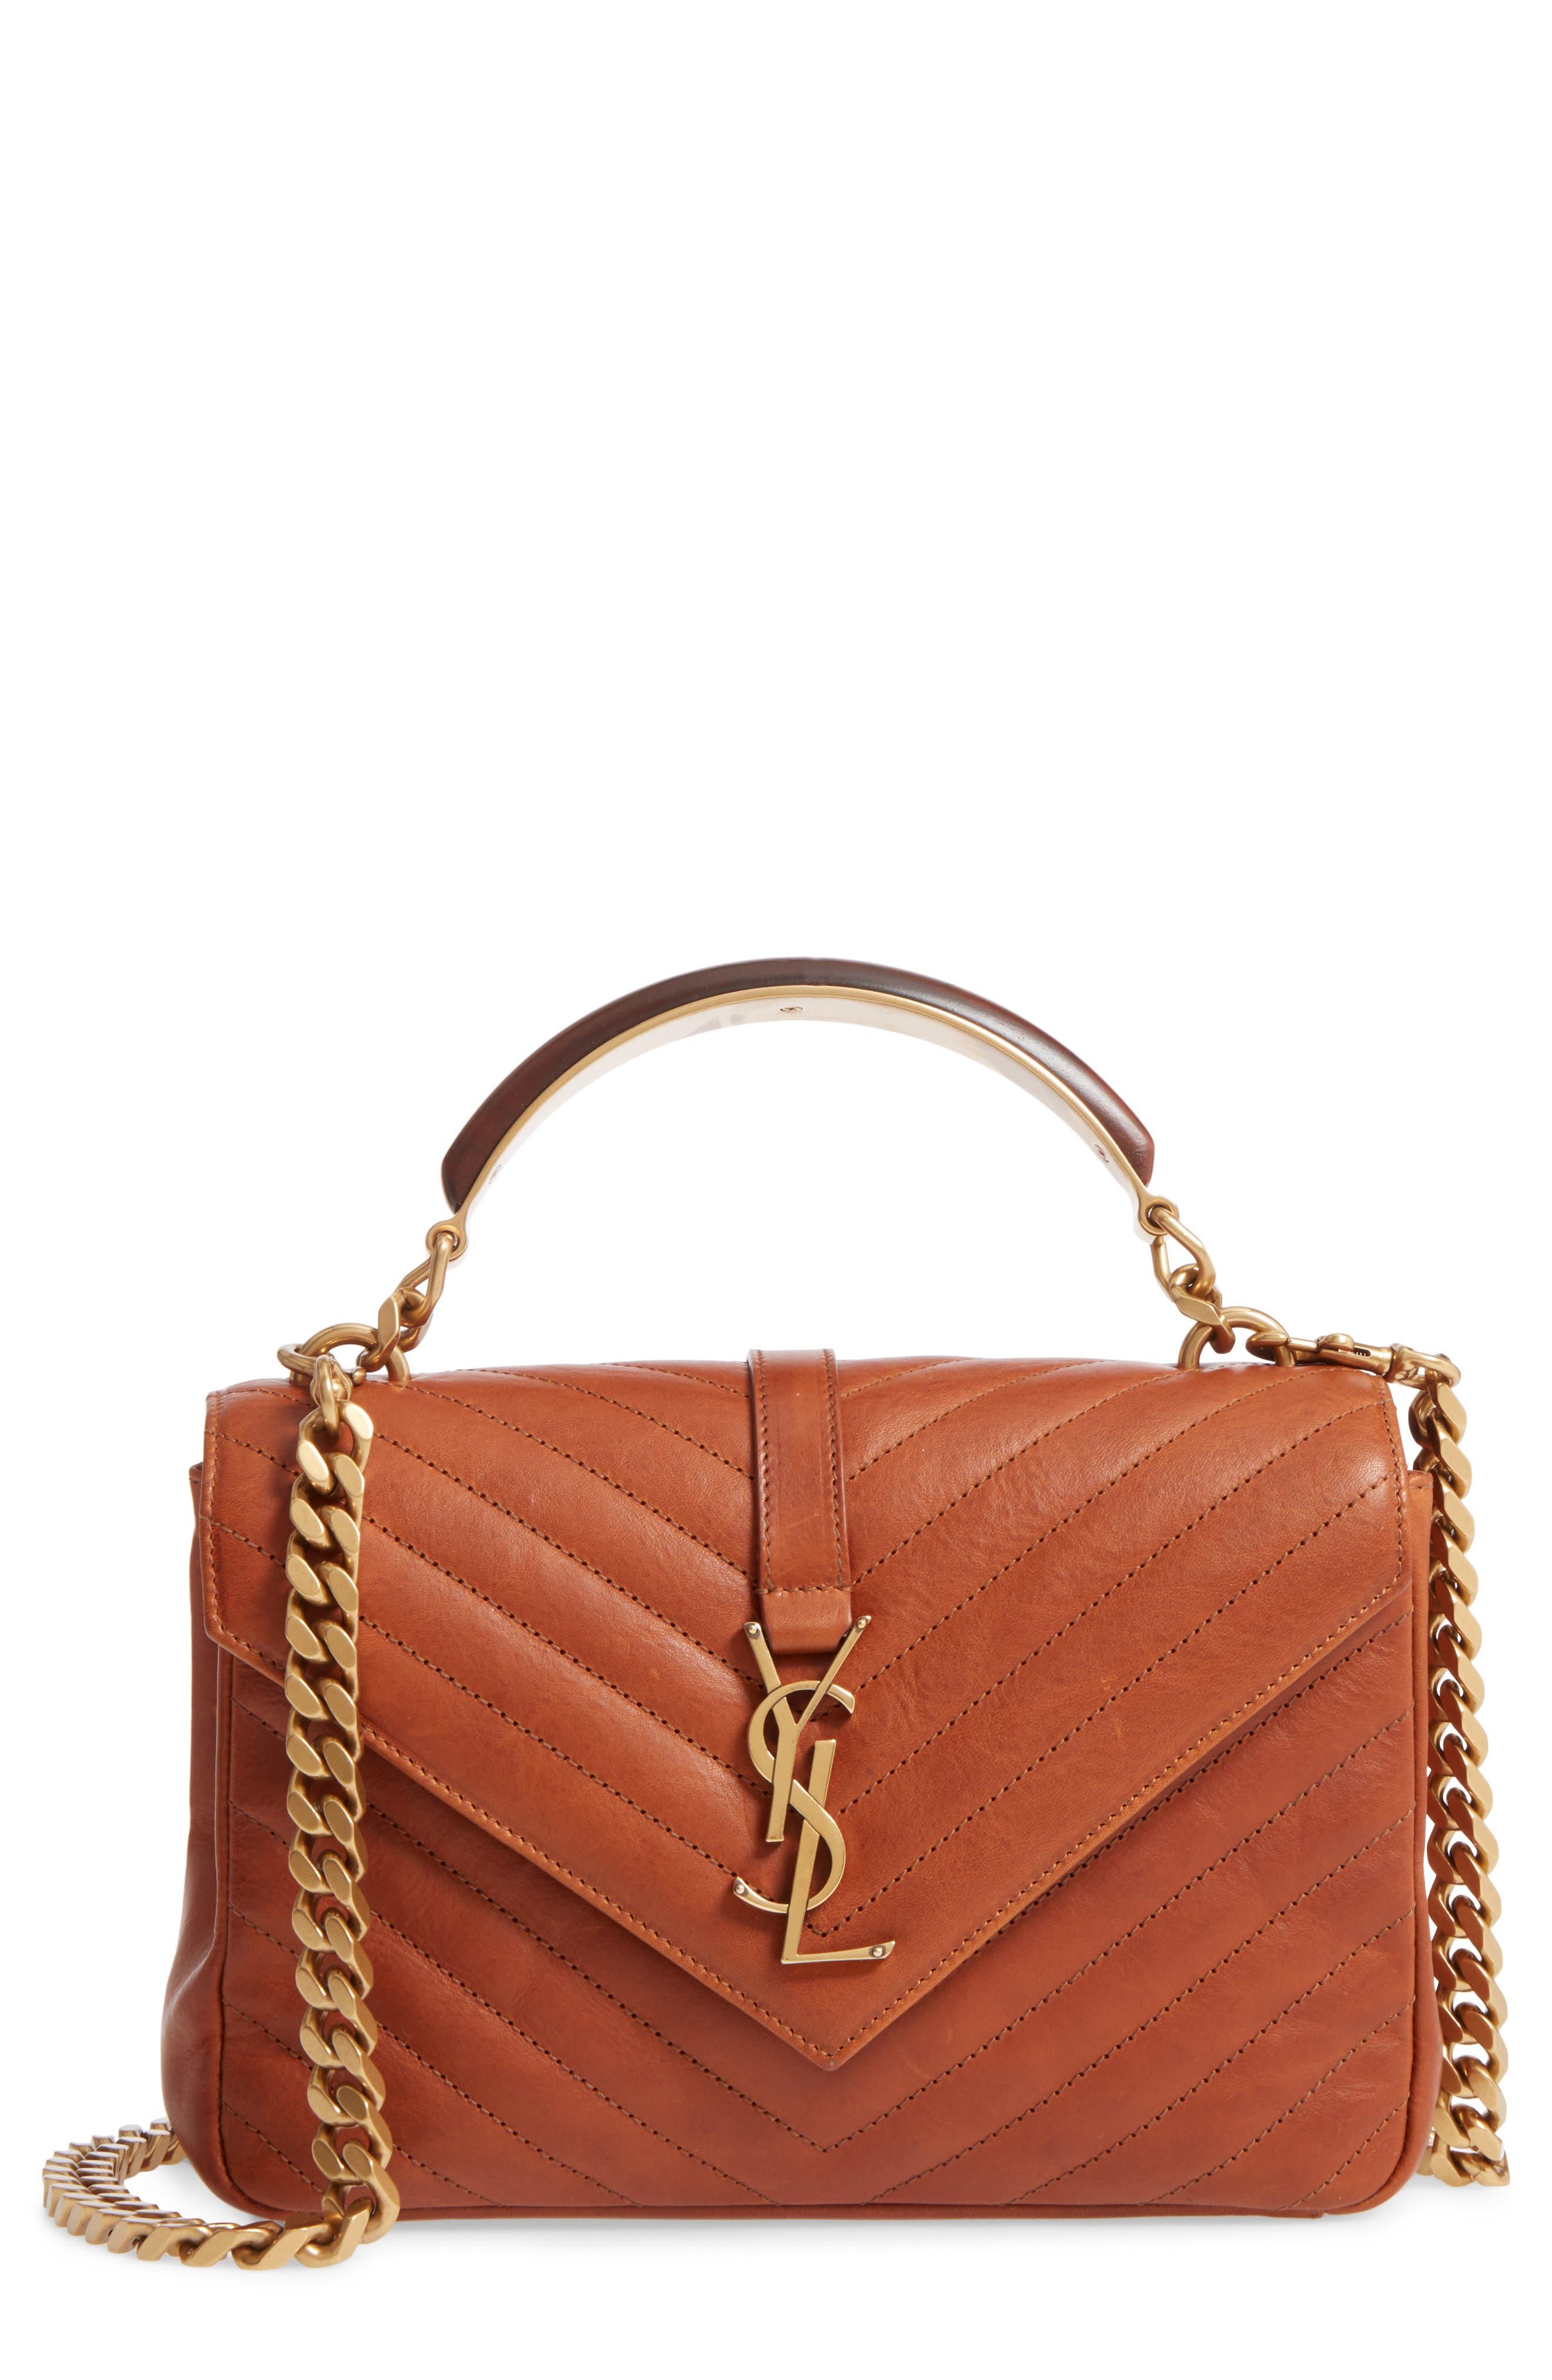 6e04b47a22cb ... Saint Laurent Medium College Matelasse Leather Top Handle Bag - Brown  In Vintage Cognac best service  Monogram Medium Shoulder ...